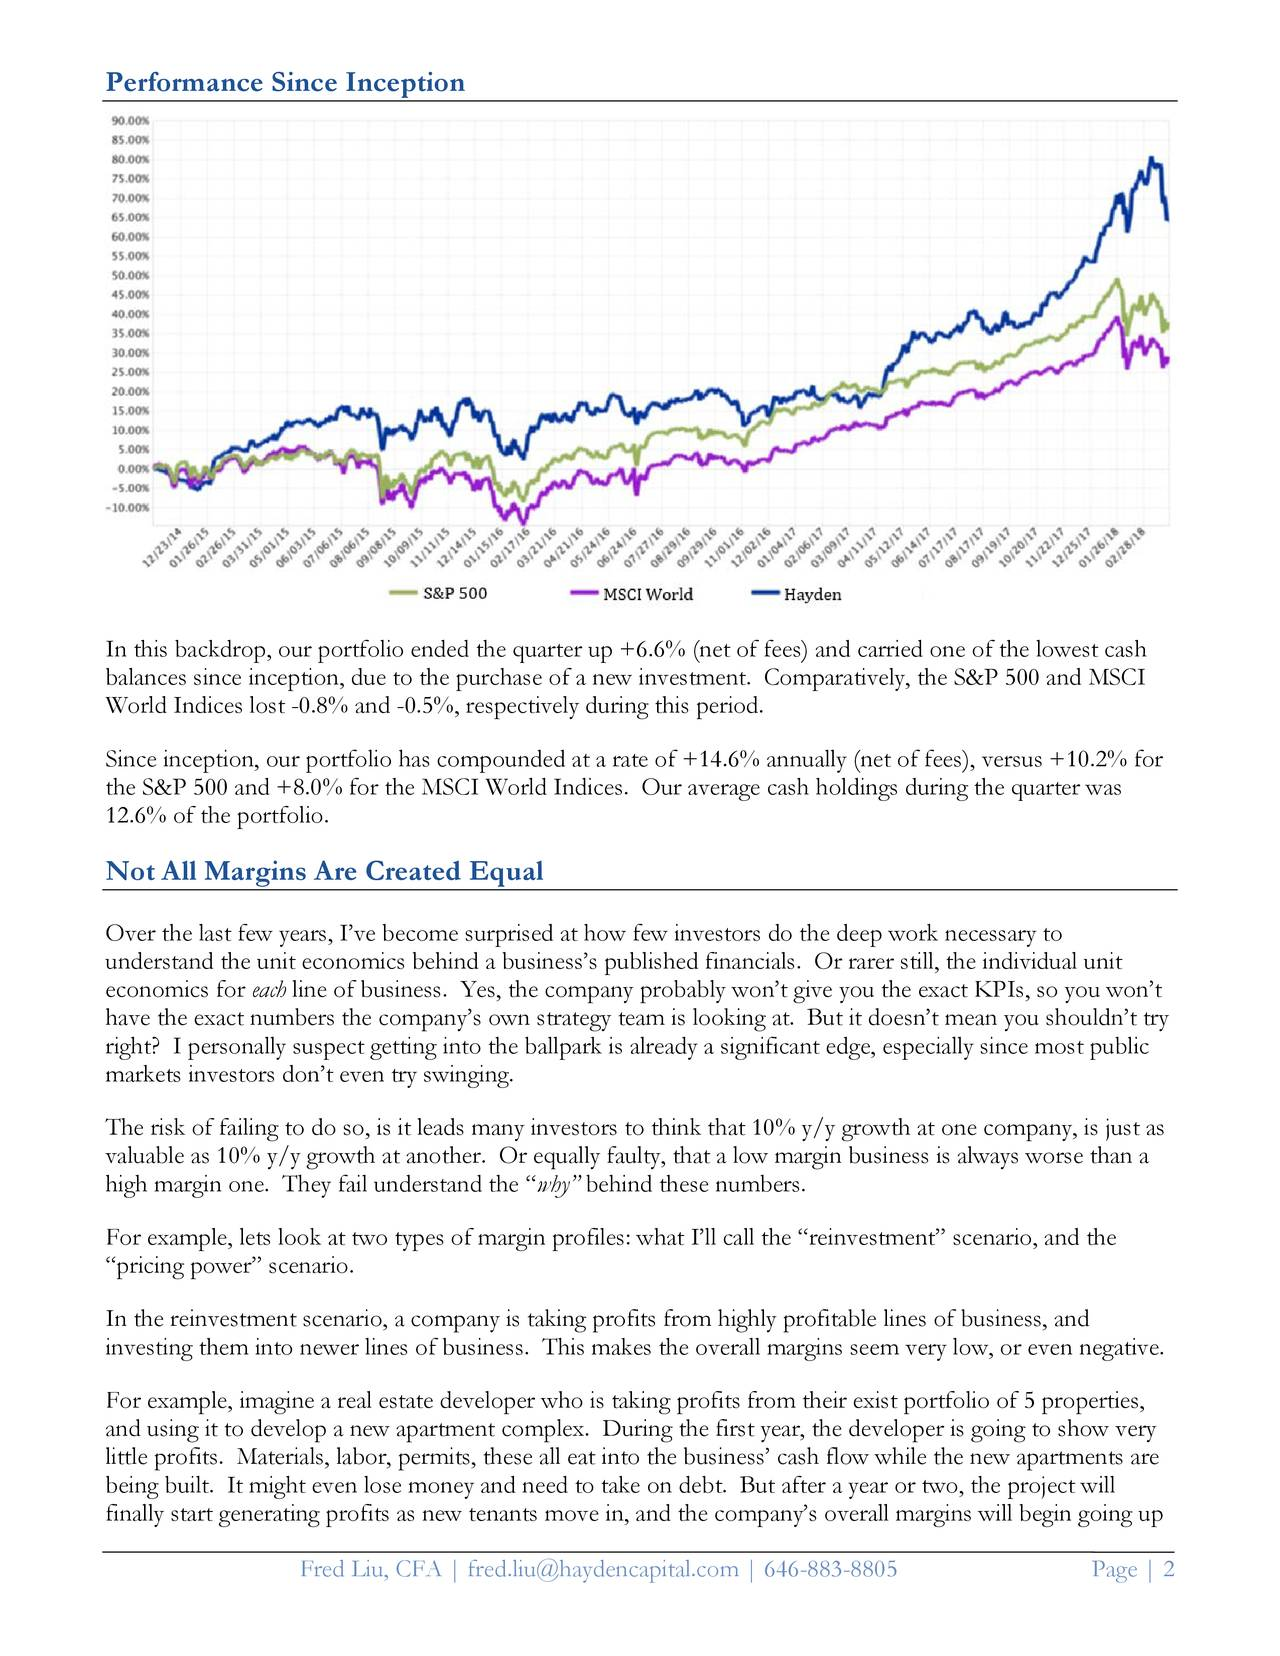 Hayden Capital Quarterly Letter Q1 2018